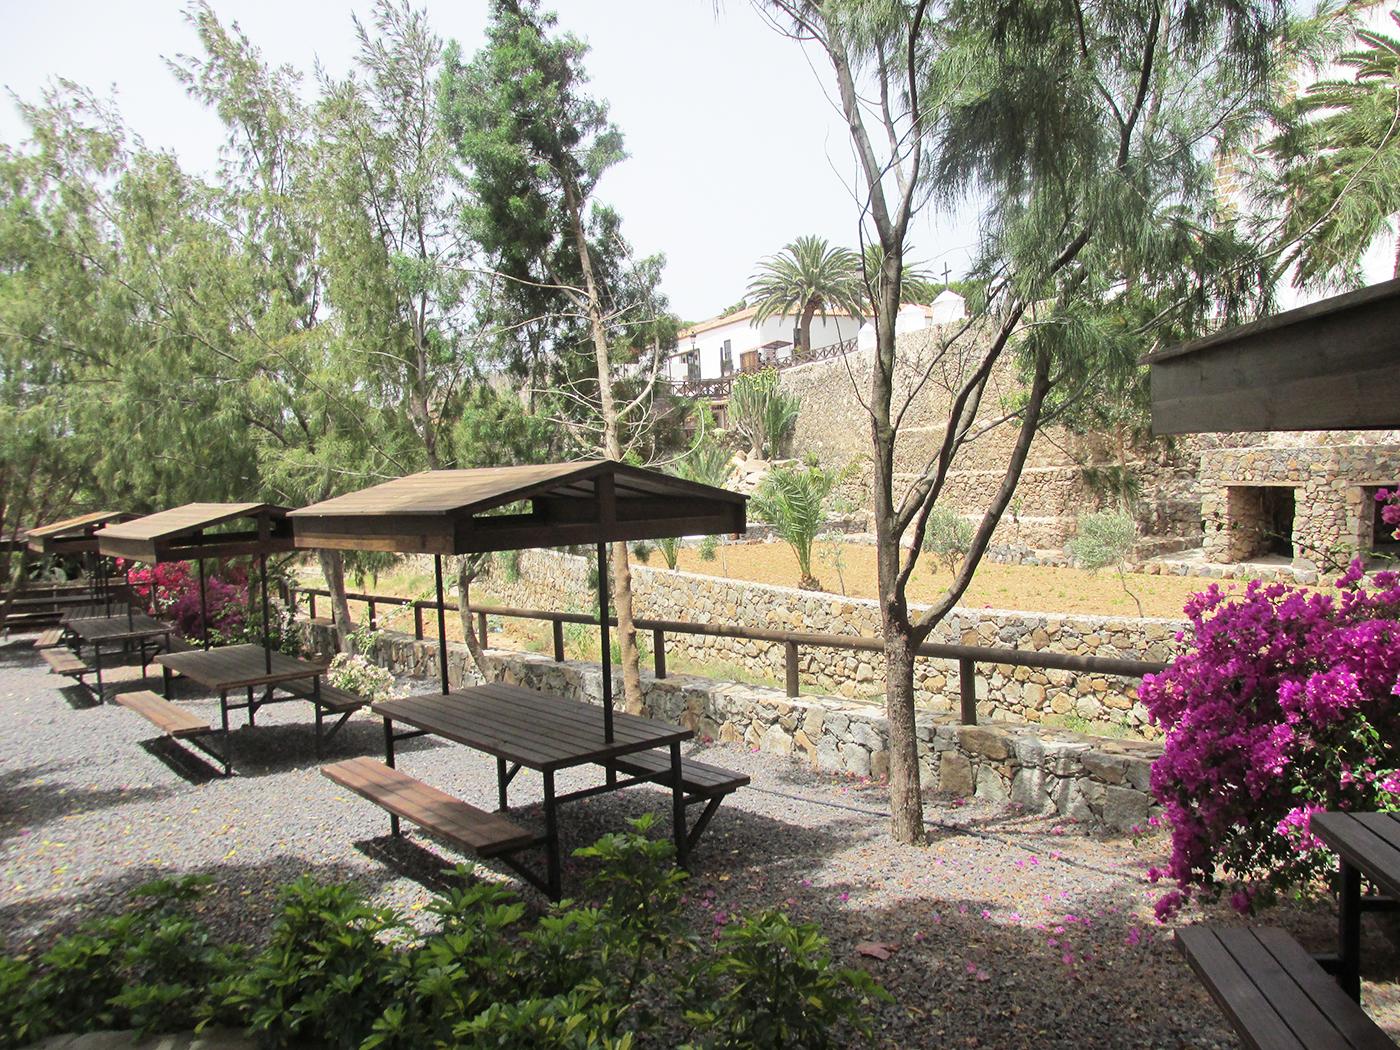 Leuke picknick plek op Fuerteventura